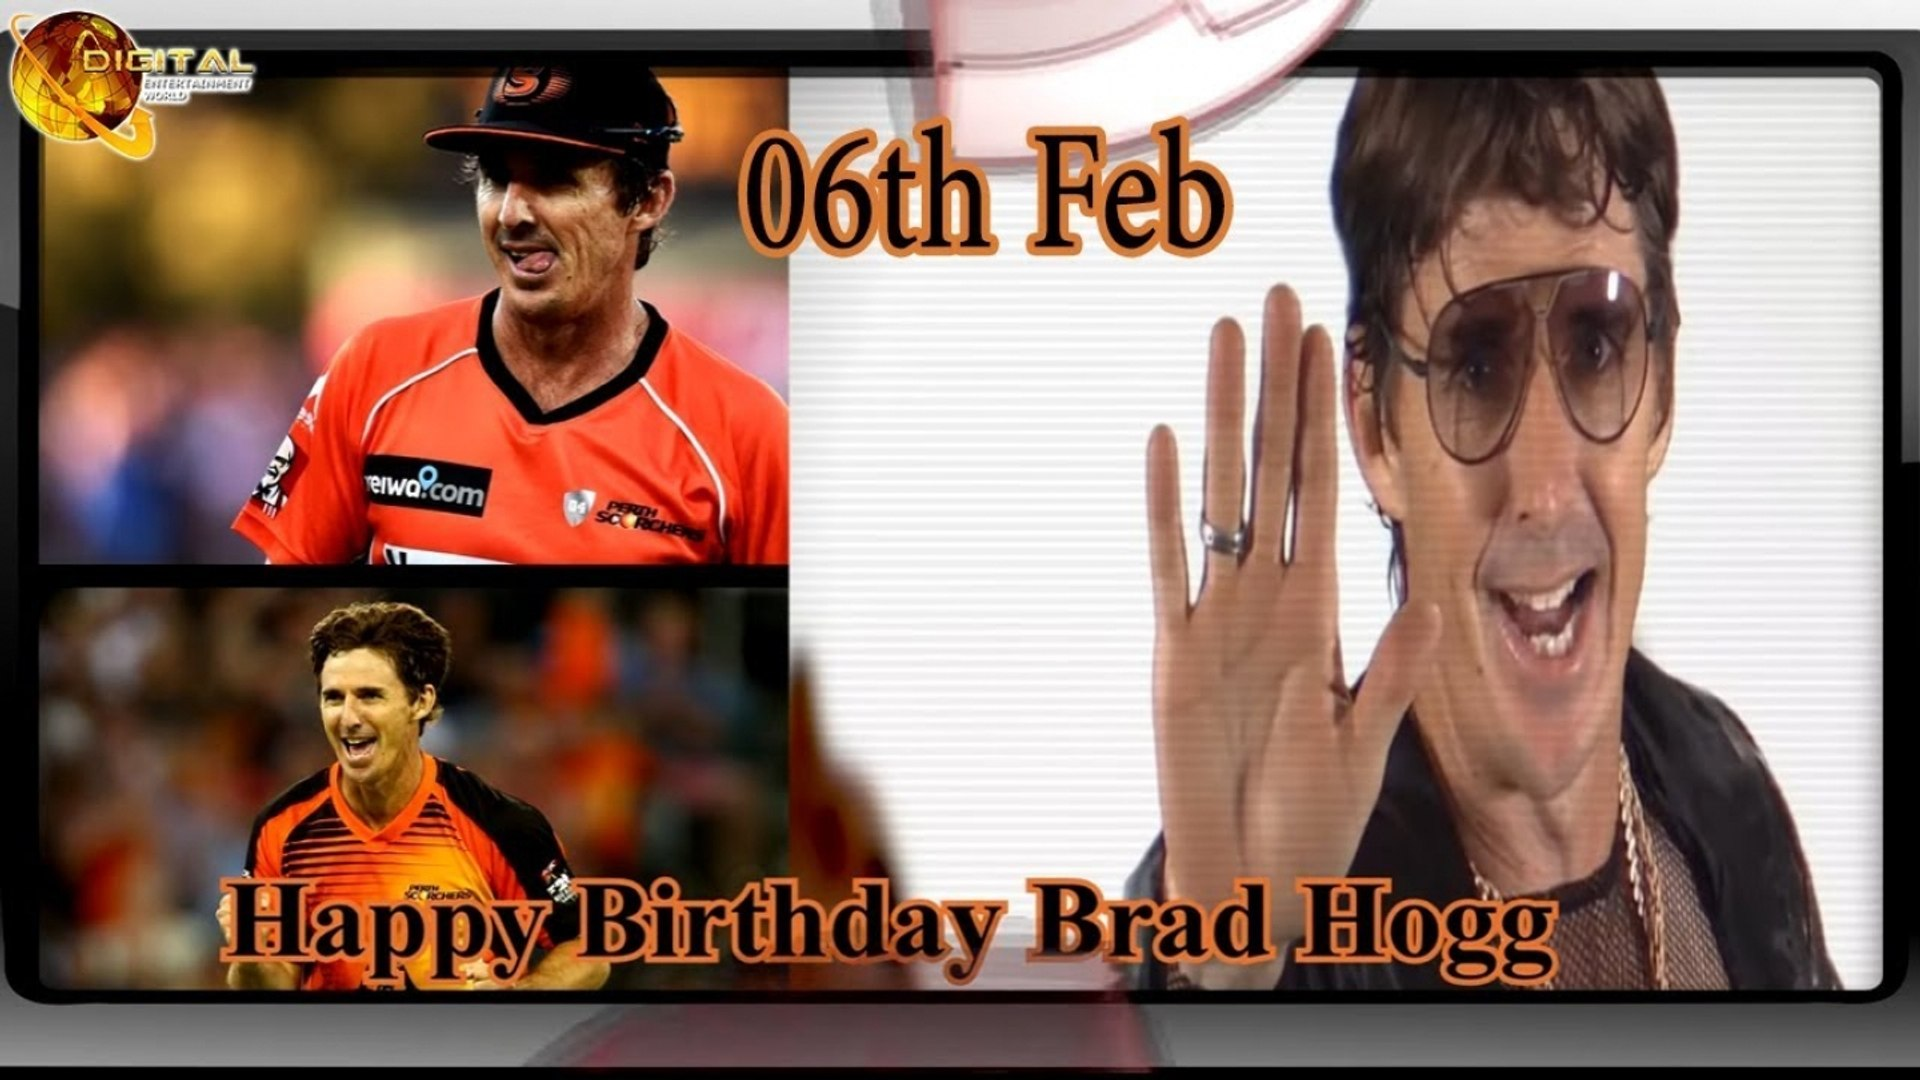 Happy Birthday Brad Hogg February 6